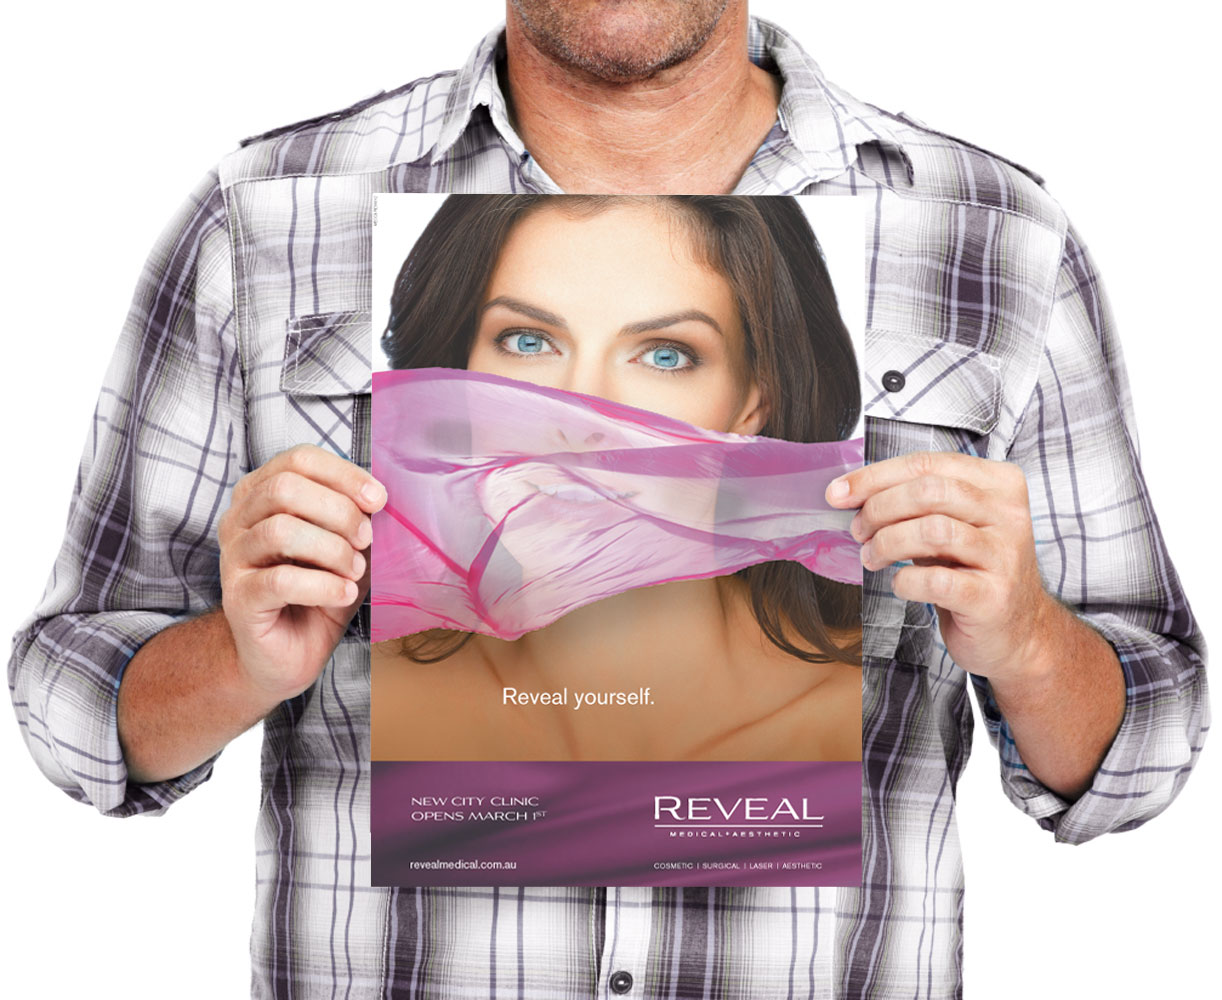 Viagra Magazine Advertisement